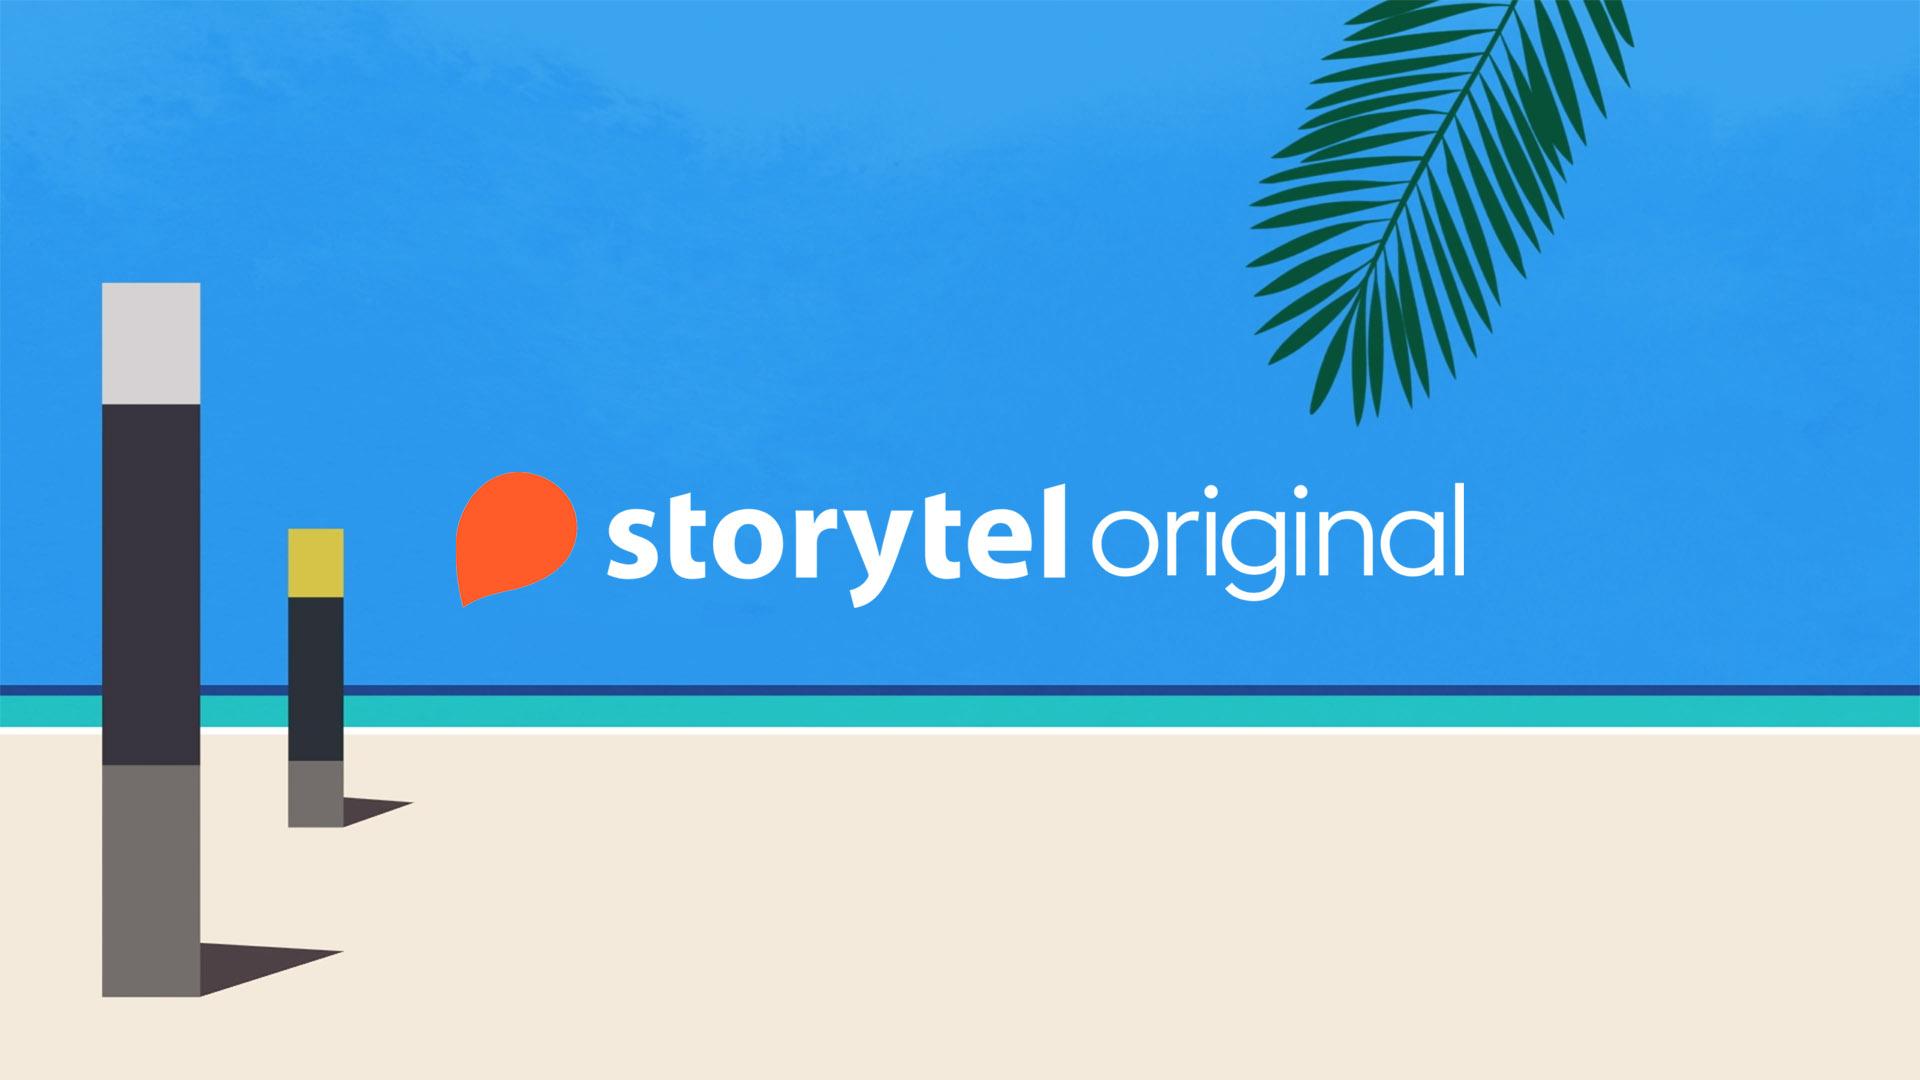 Storytel Original